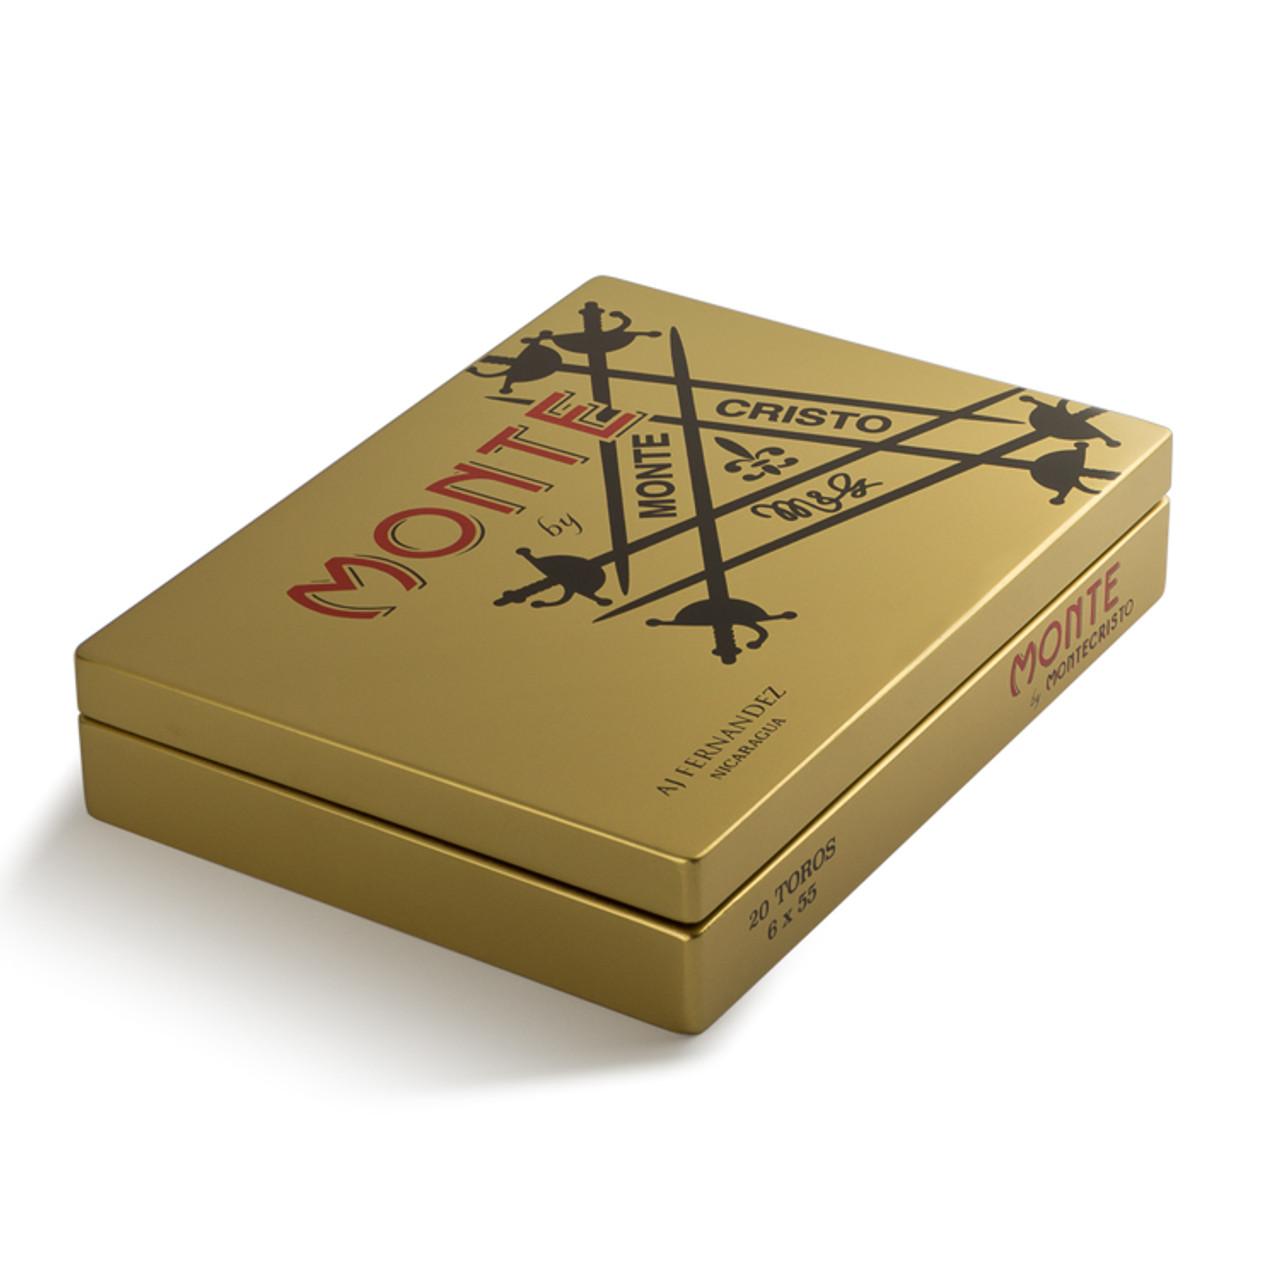 Monte by Montecristo AJ Fernandez Robusto Cigars - 4.25 x 54 (Box of 20)